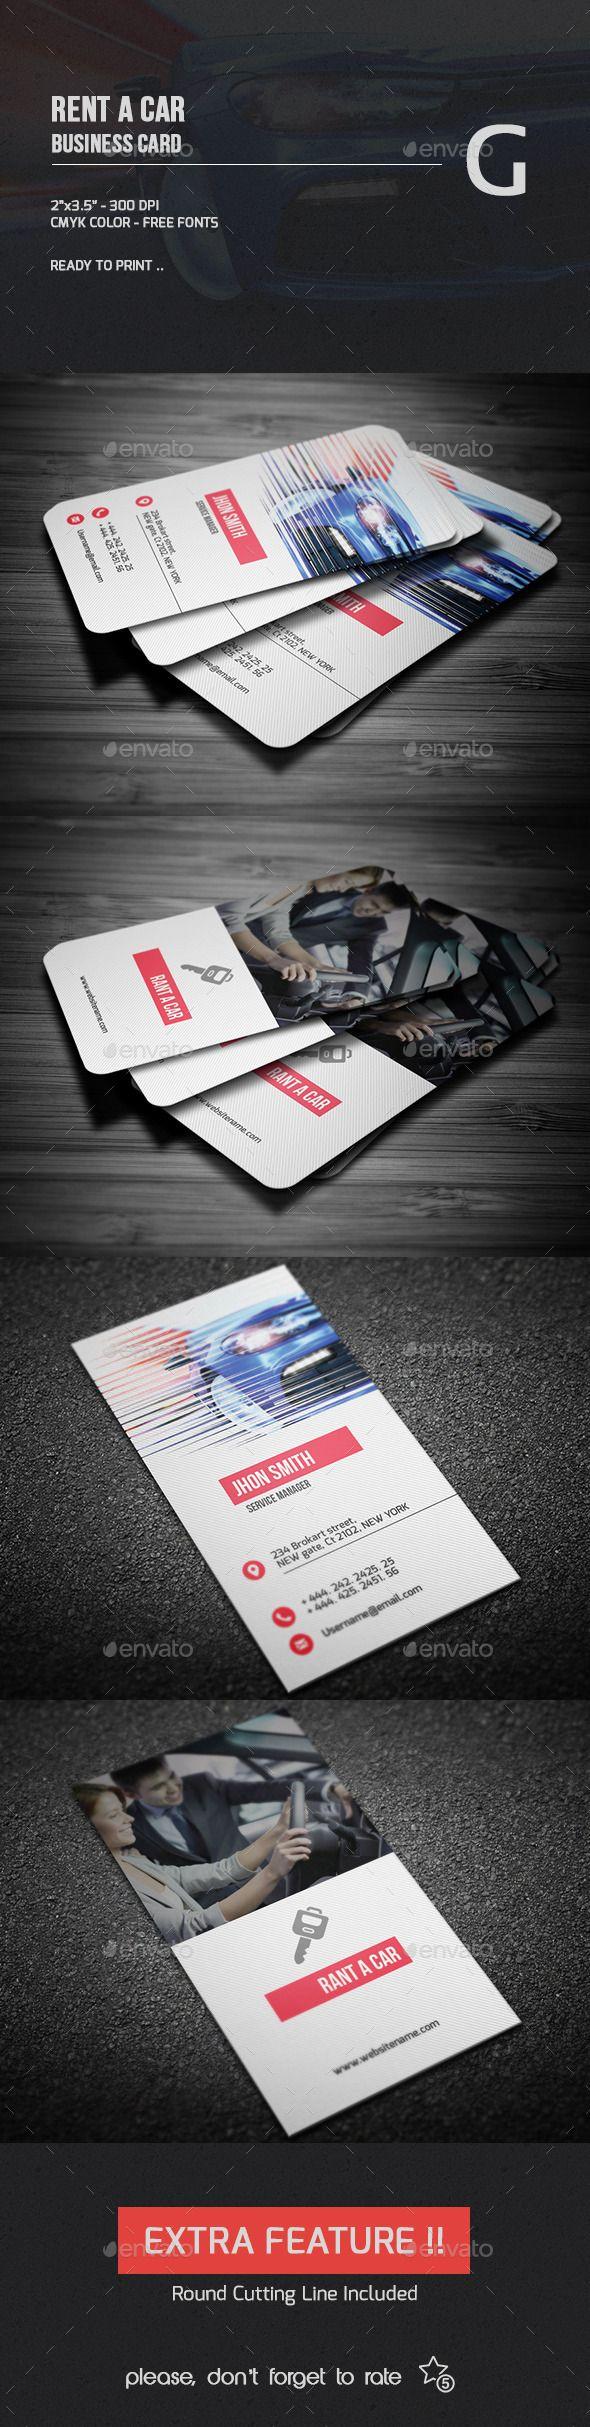 12 best business card images on pinterest business card design